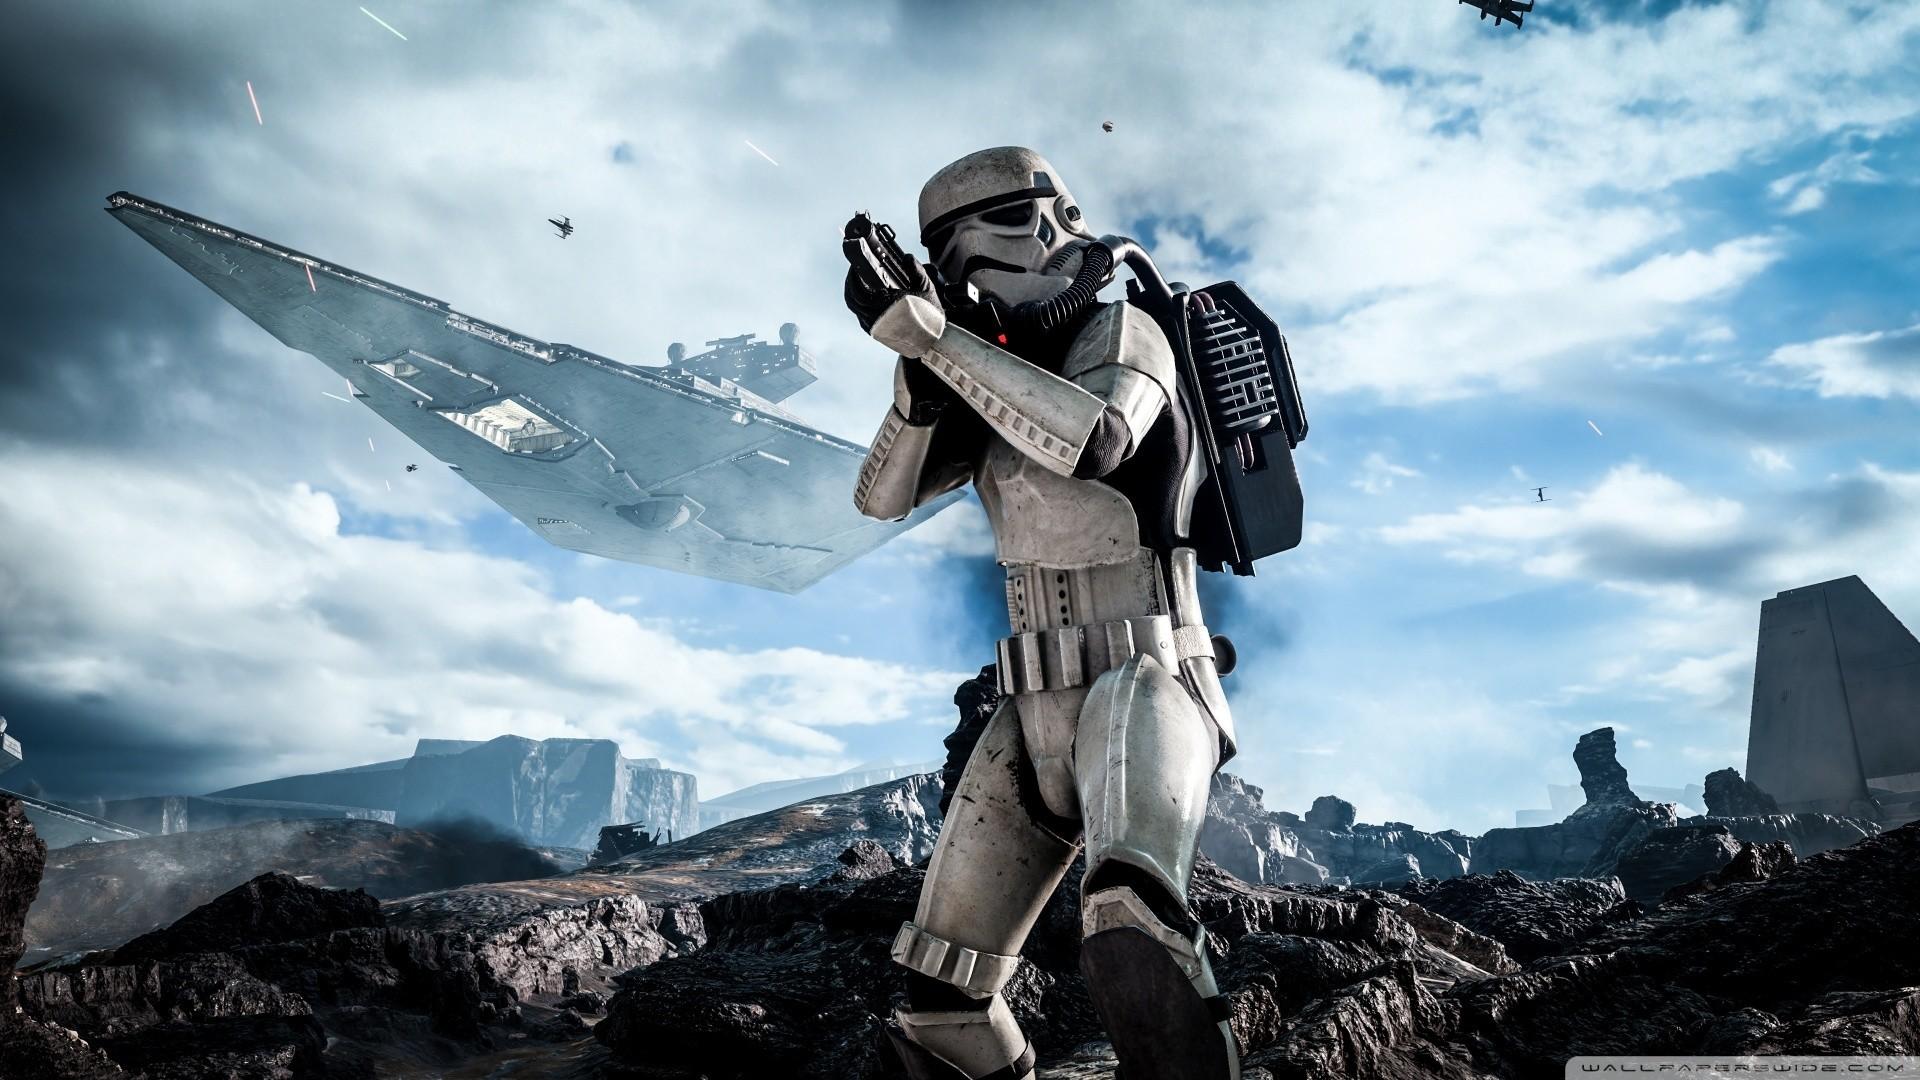 Star Wars Battlefront Stormtrooper HD Wide Wallpaper for Widescreen